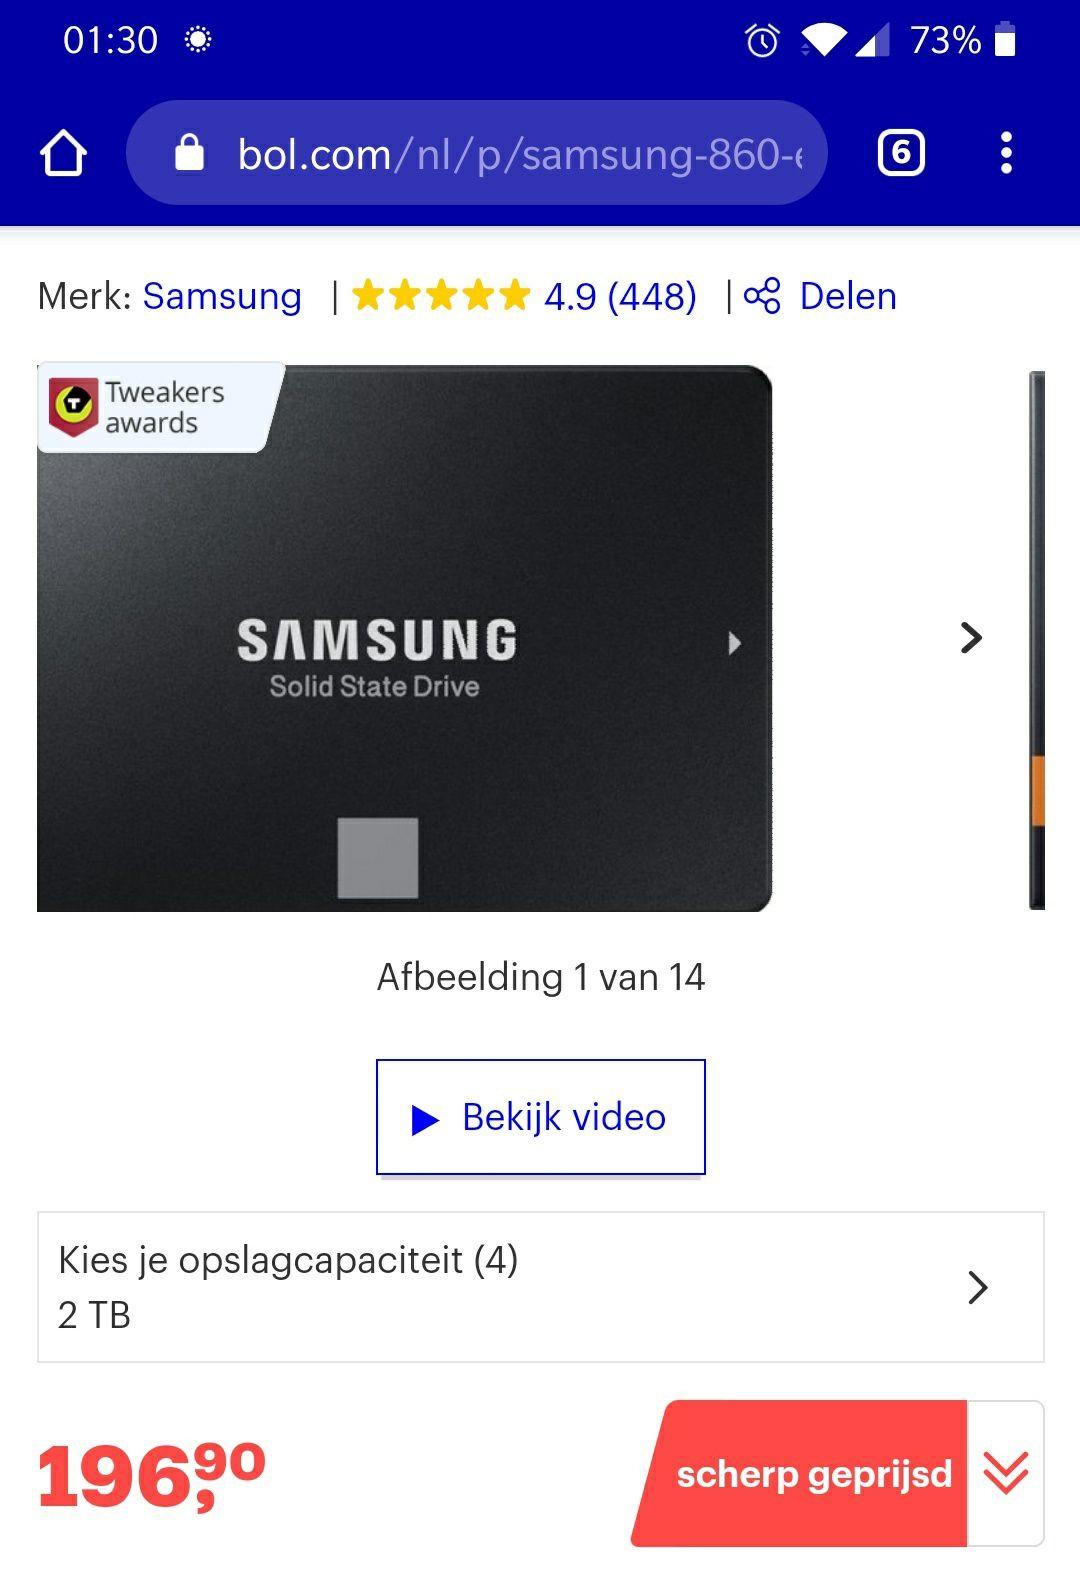 Samsung 860 2TB SSD